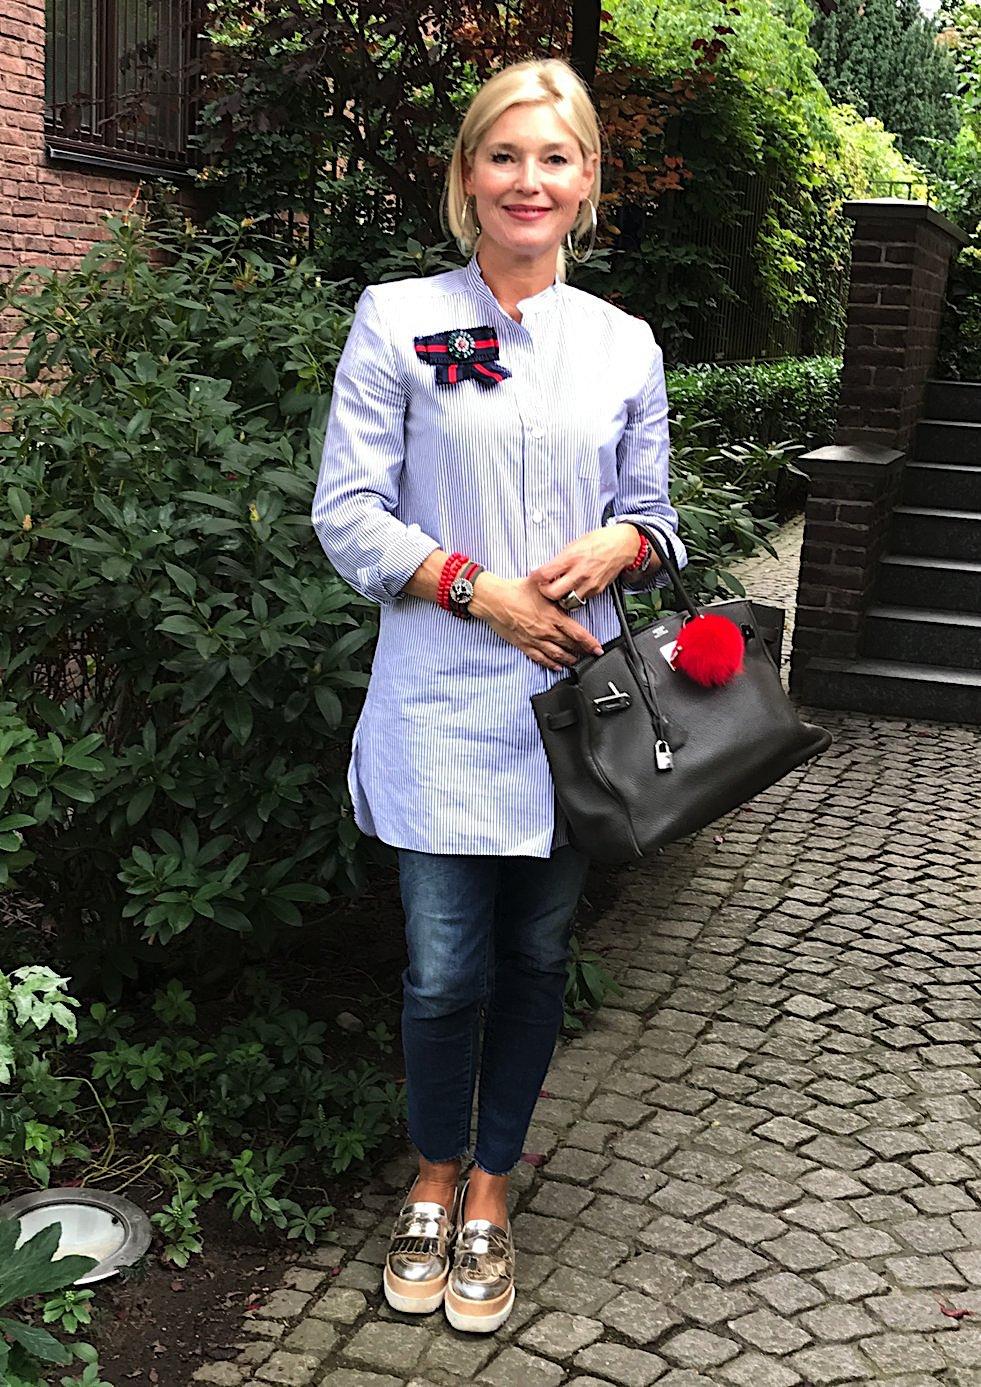 Petra Dieners, Brosche Trend, Fashion-Blog, Lieblingsstil.com,